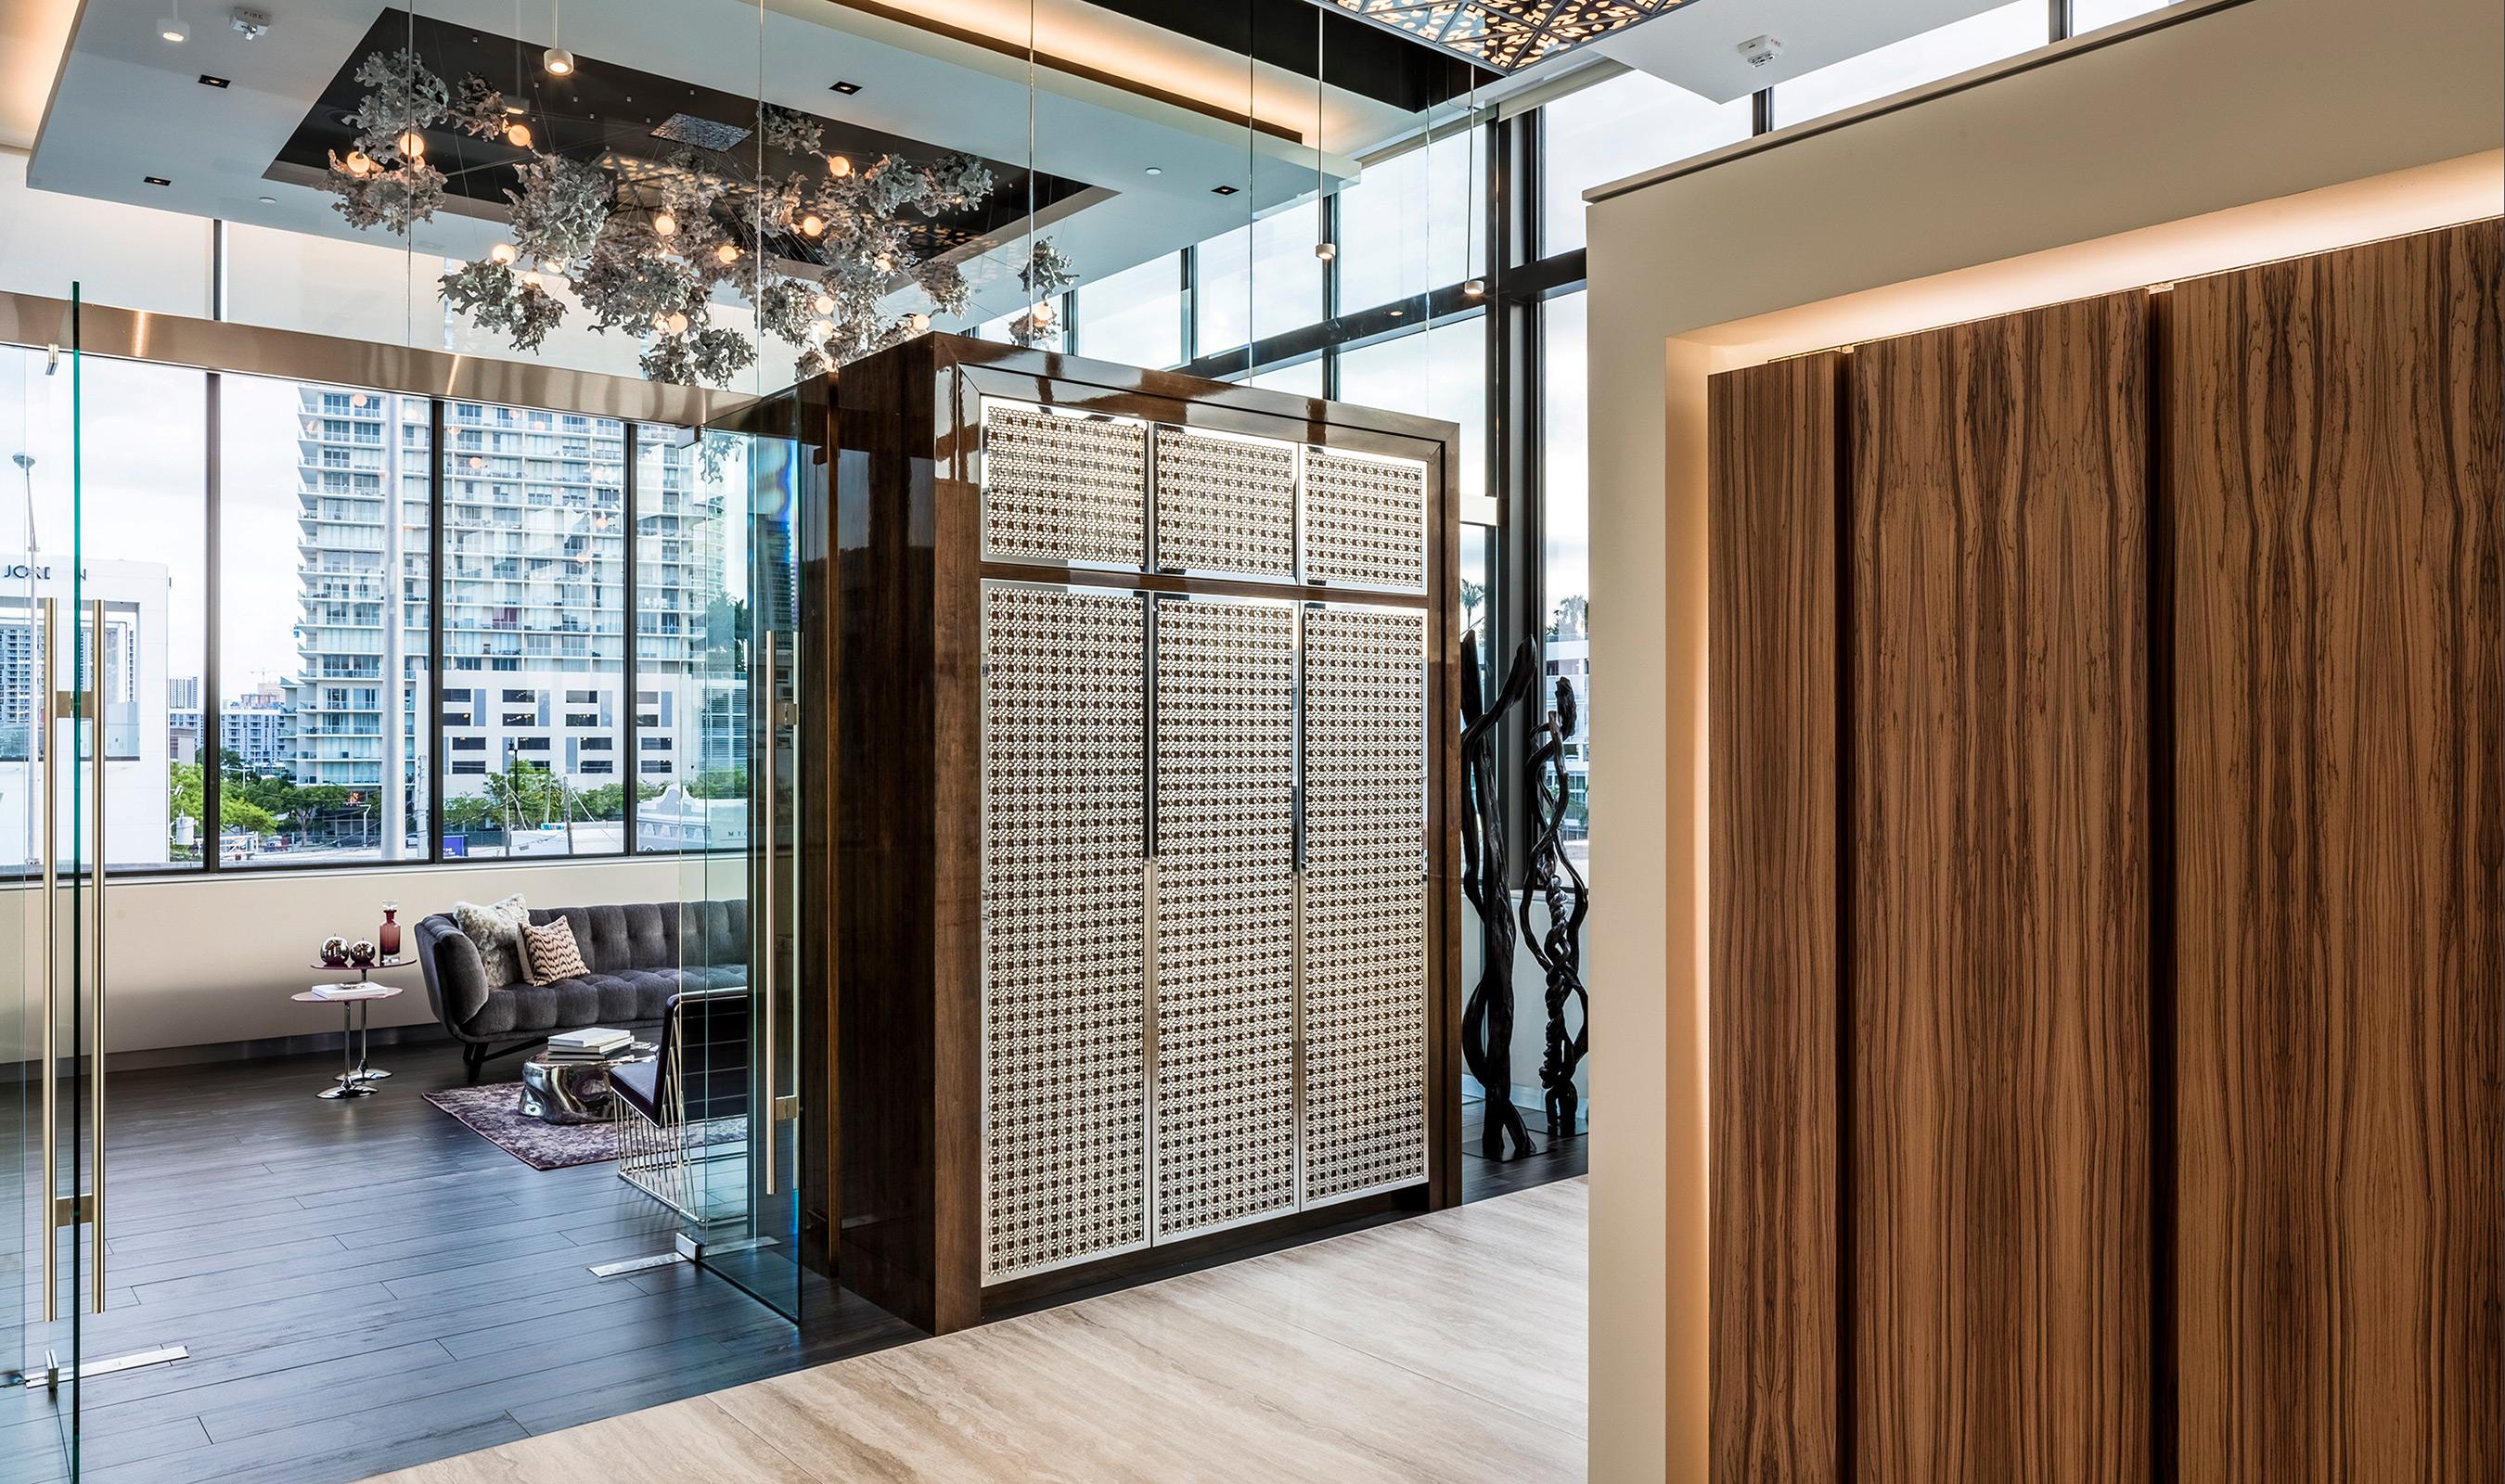 M33-5 wire mesh stainless steel kitchen showroom display